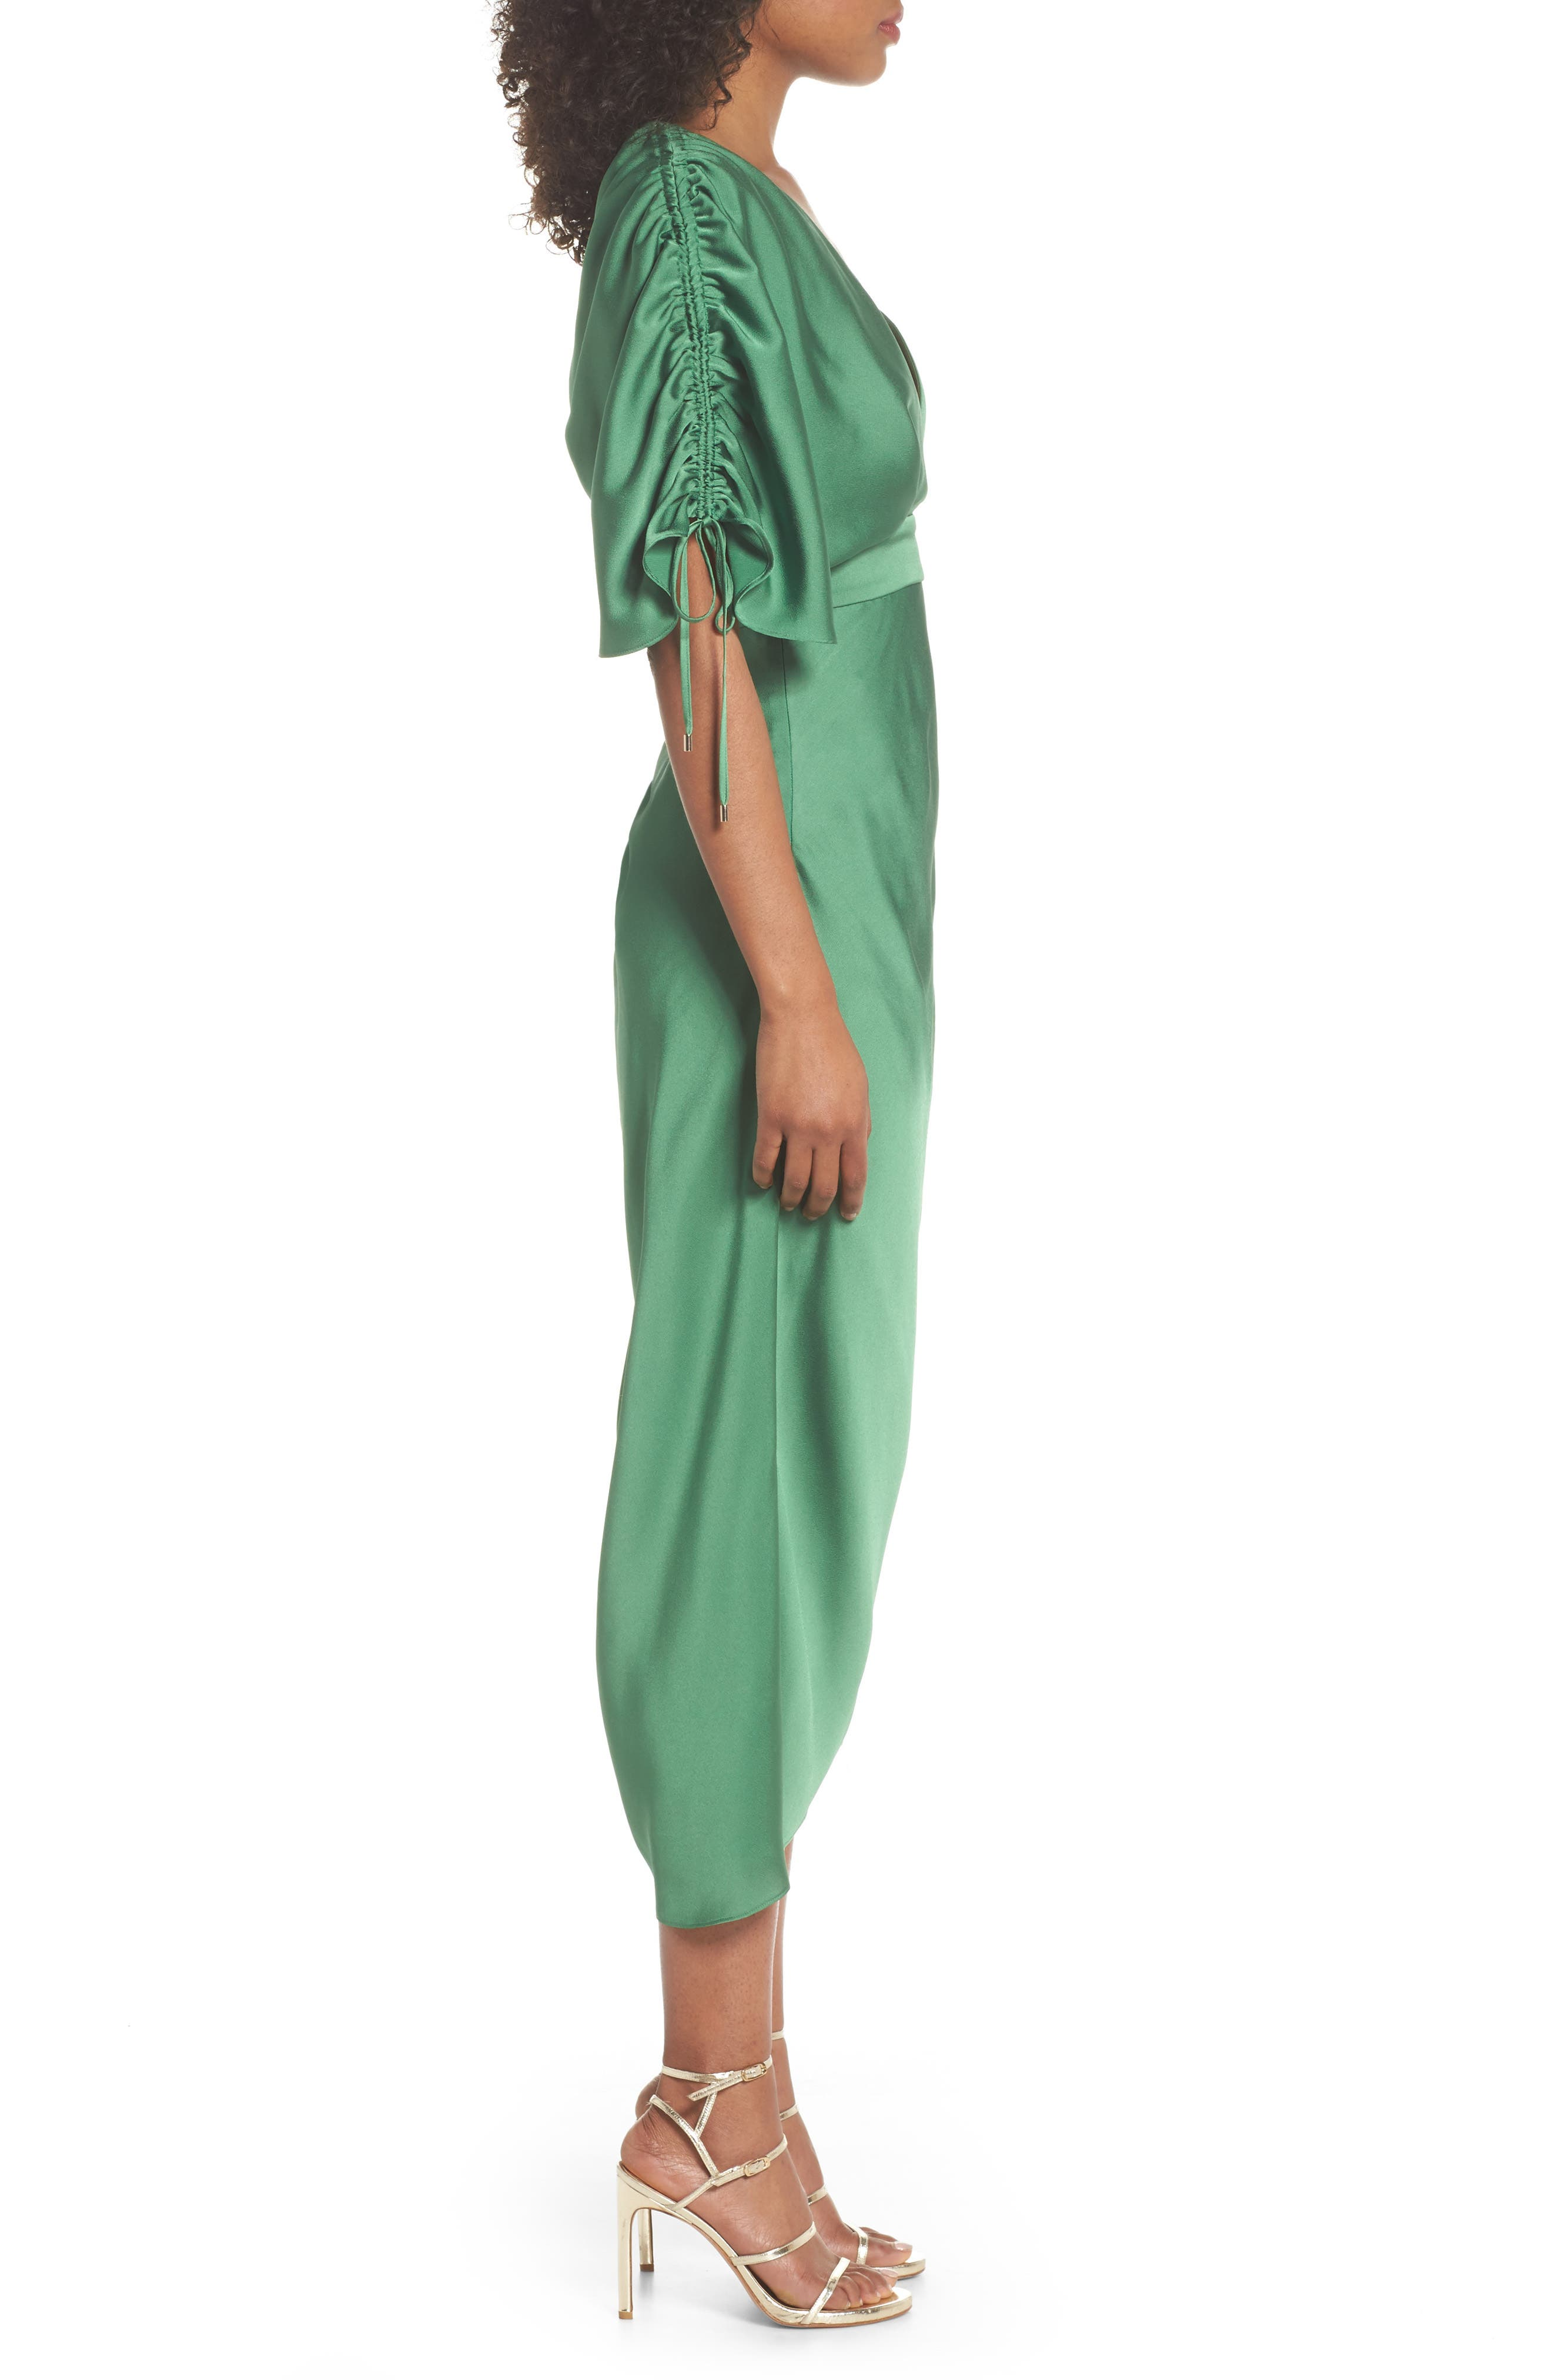 I've Got You Asymmetrical Satin Dress,                             Alternate thumbnail 3, color,                             310